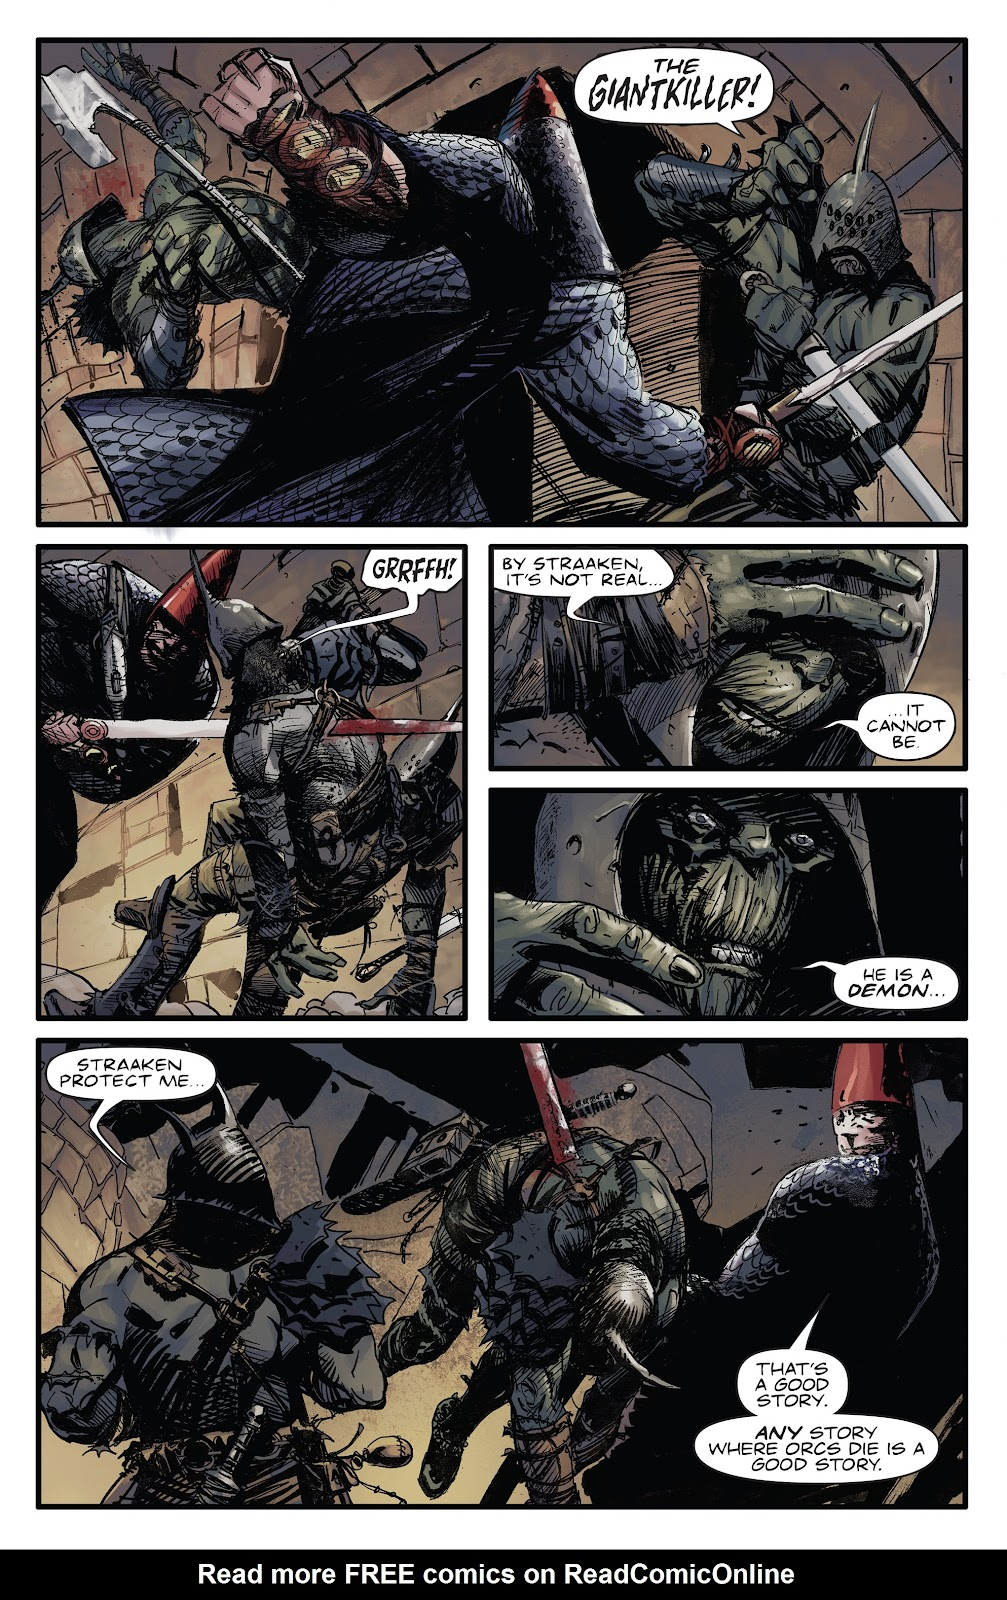 Read online Giantkillers One-Shot comic -  Issue # Full - 7